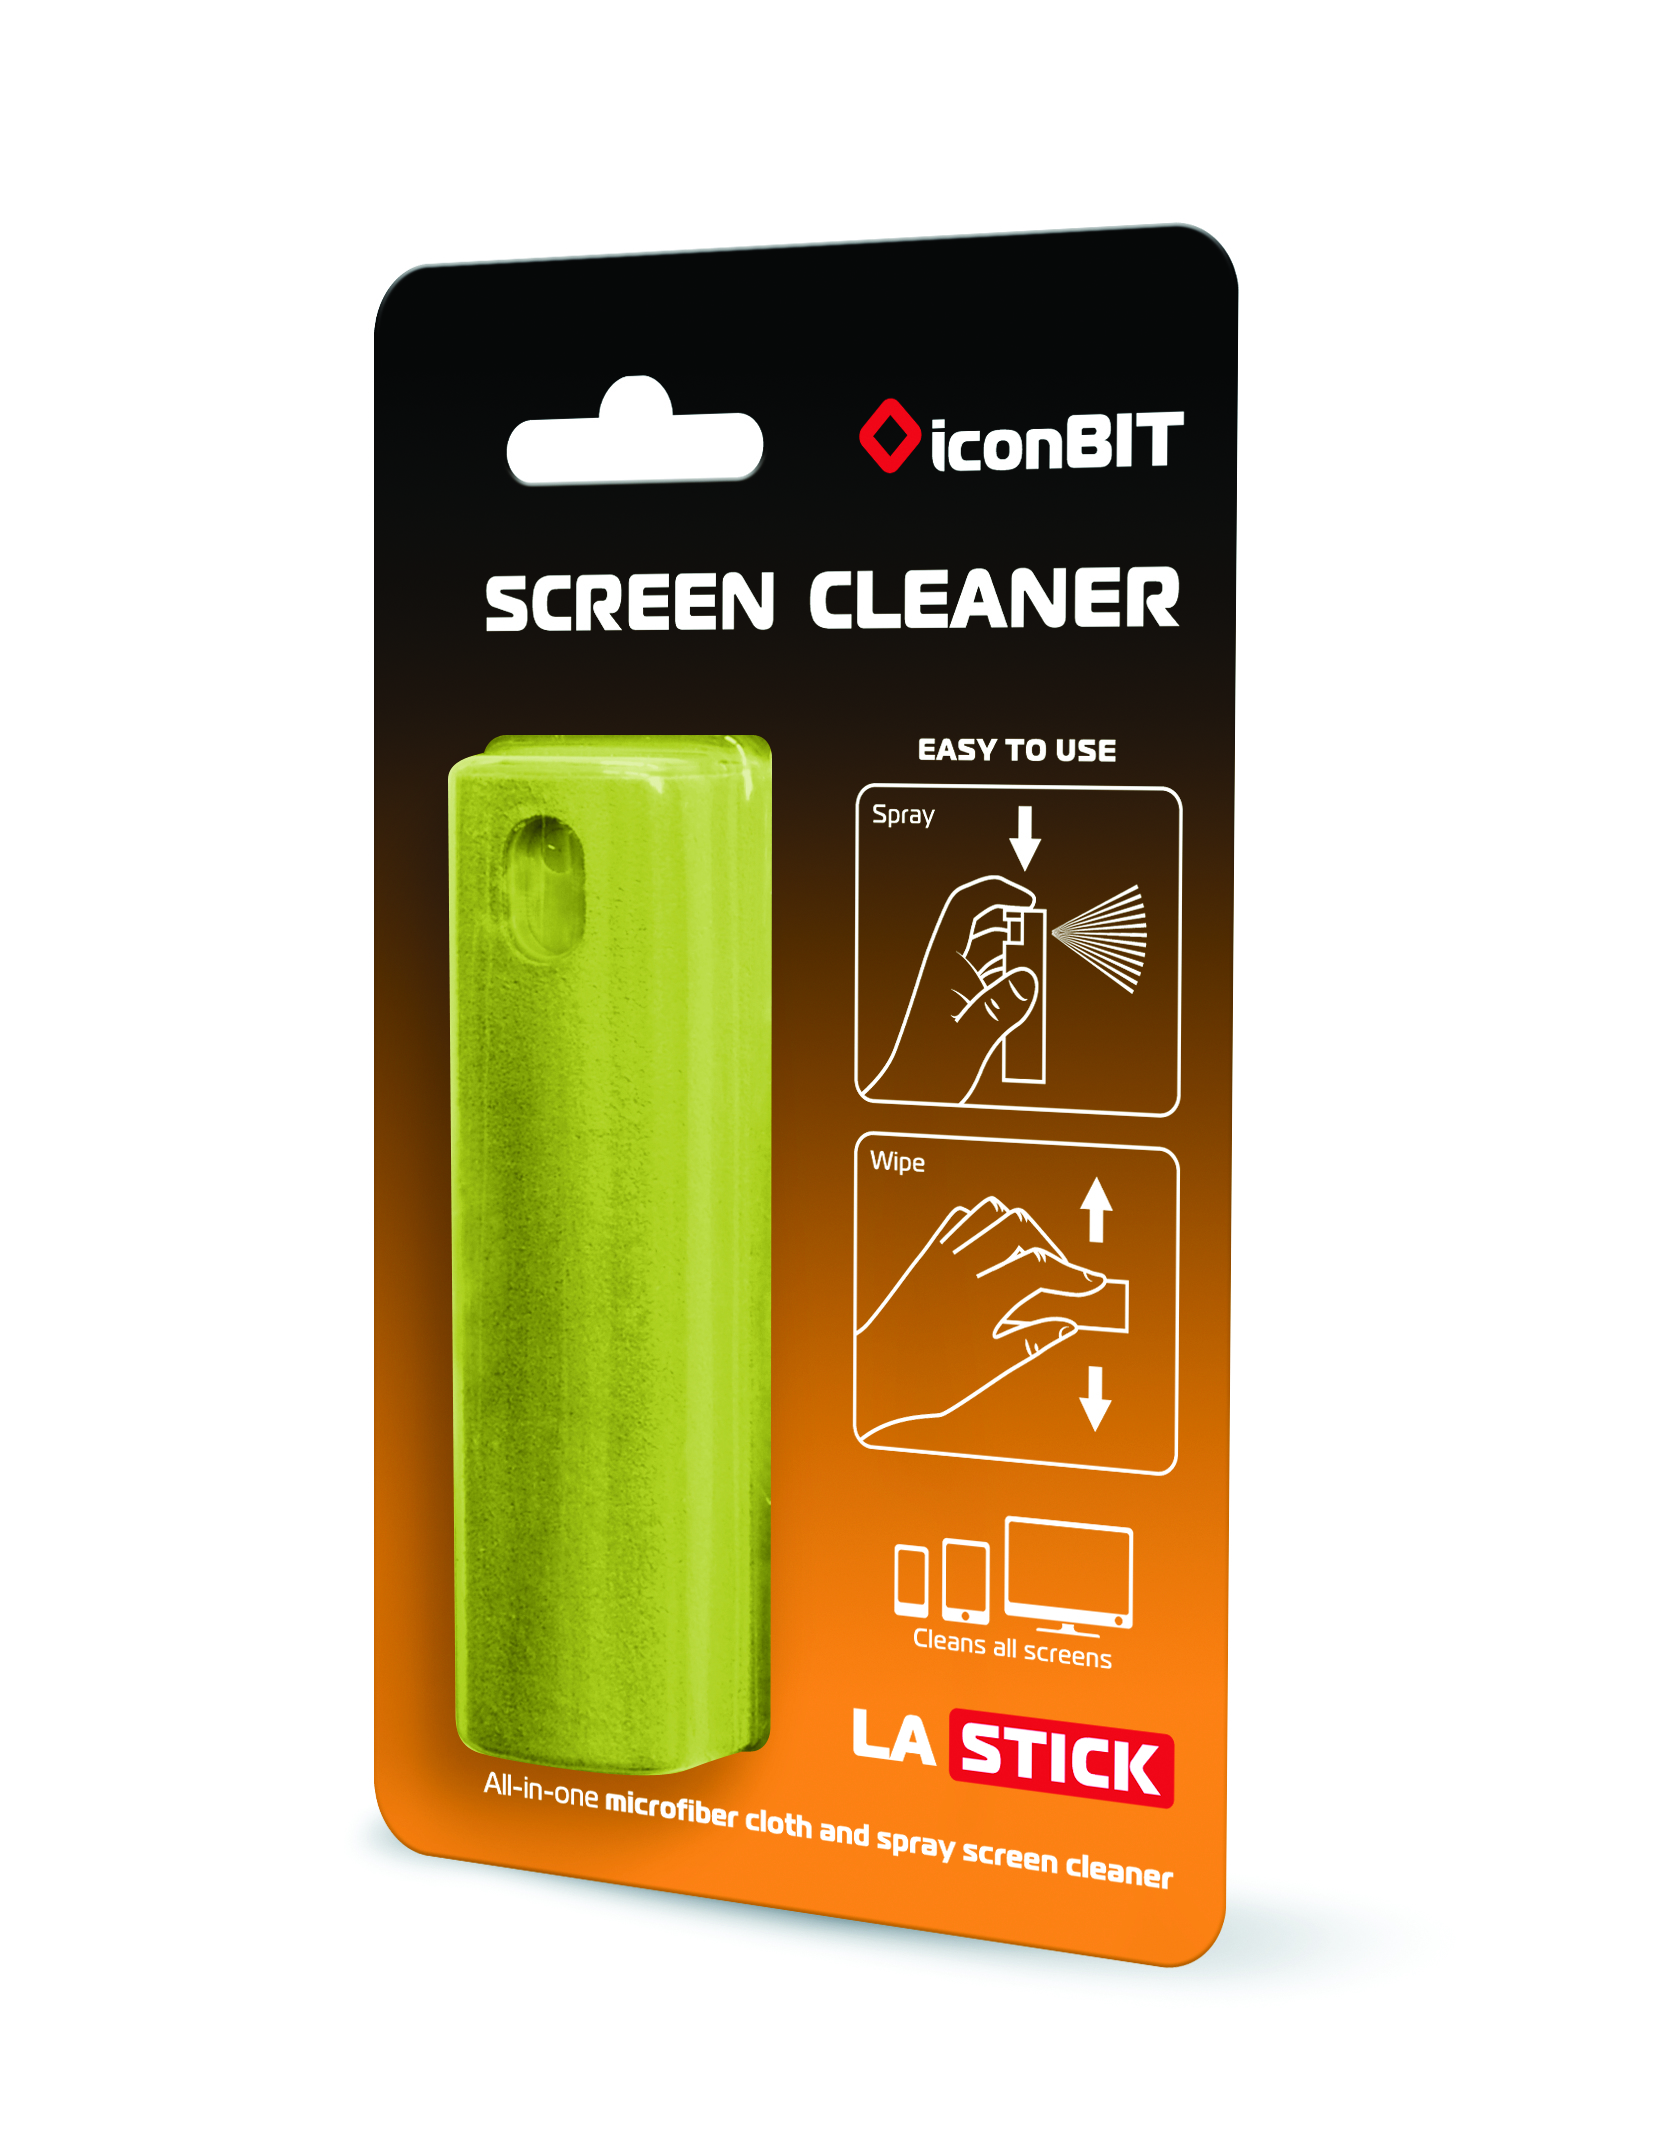 iconBIT LASTICK - Gerätereinigungsspray & Trockentuch - LCD / TFT / Plasma - 10 ml - Grün - 91 mm - 1 Stück(e)